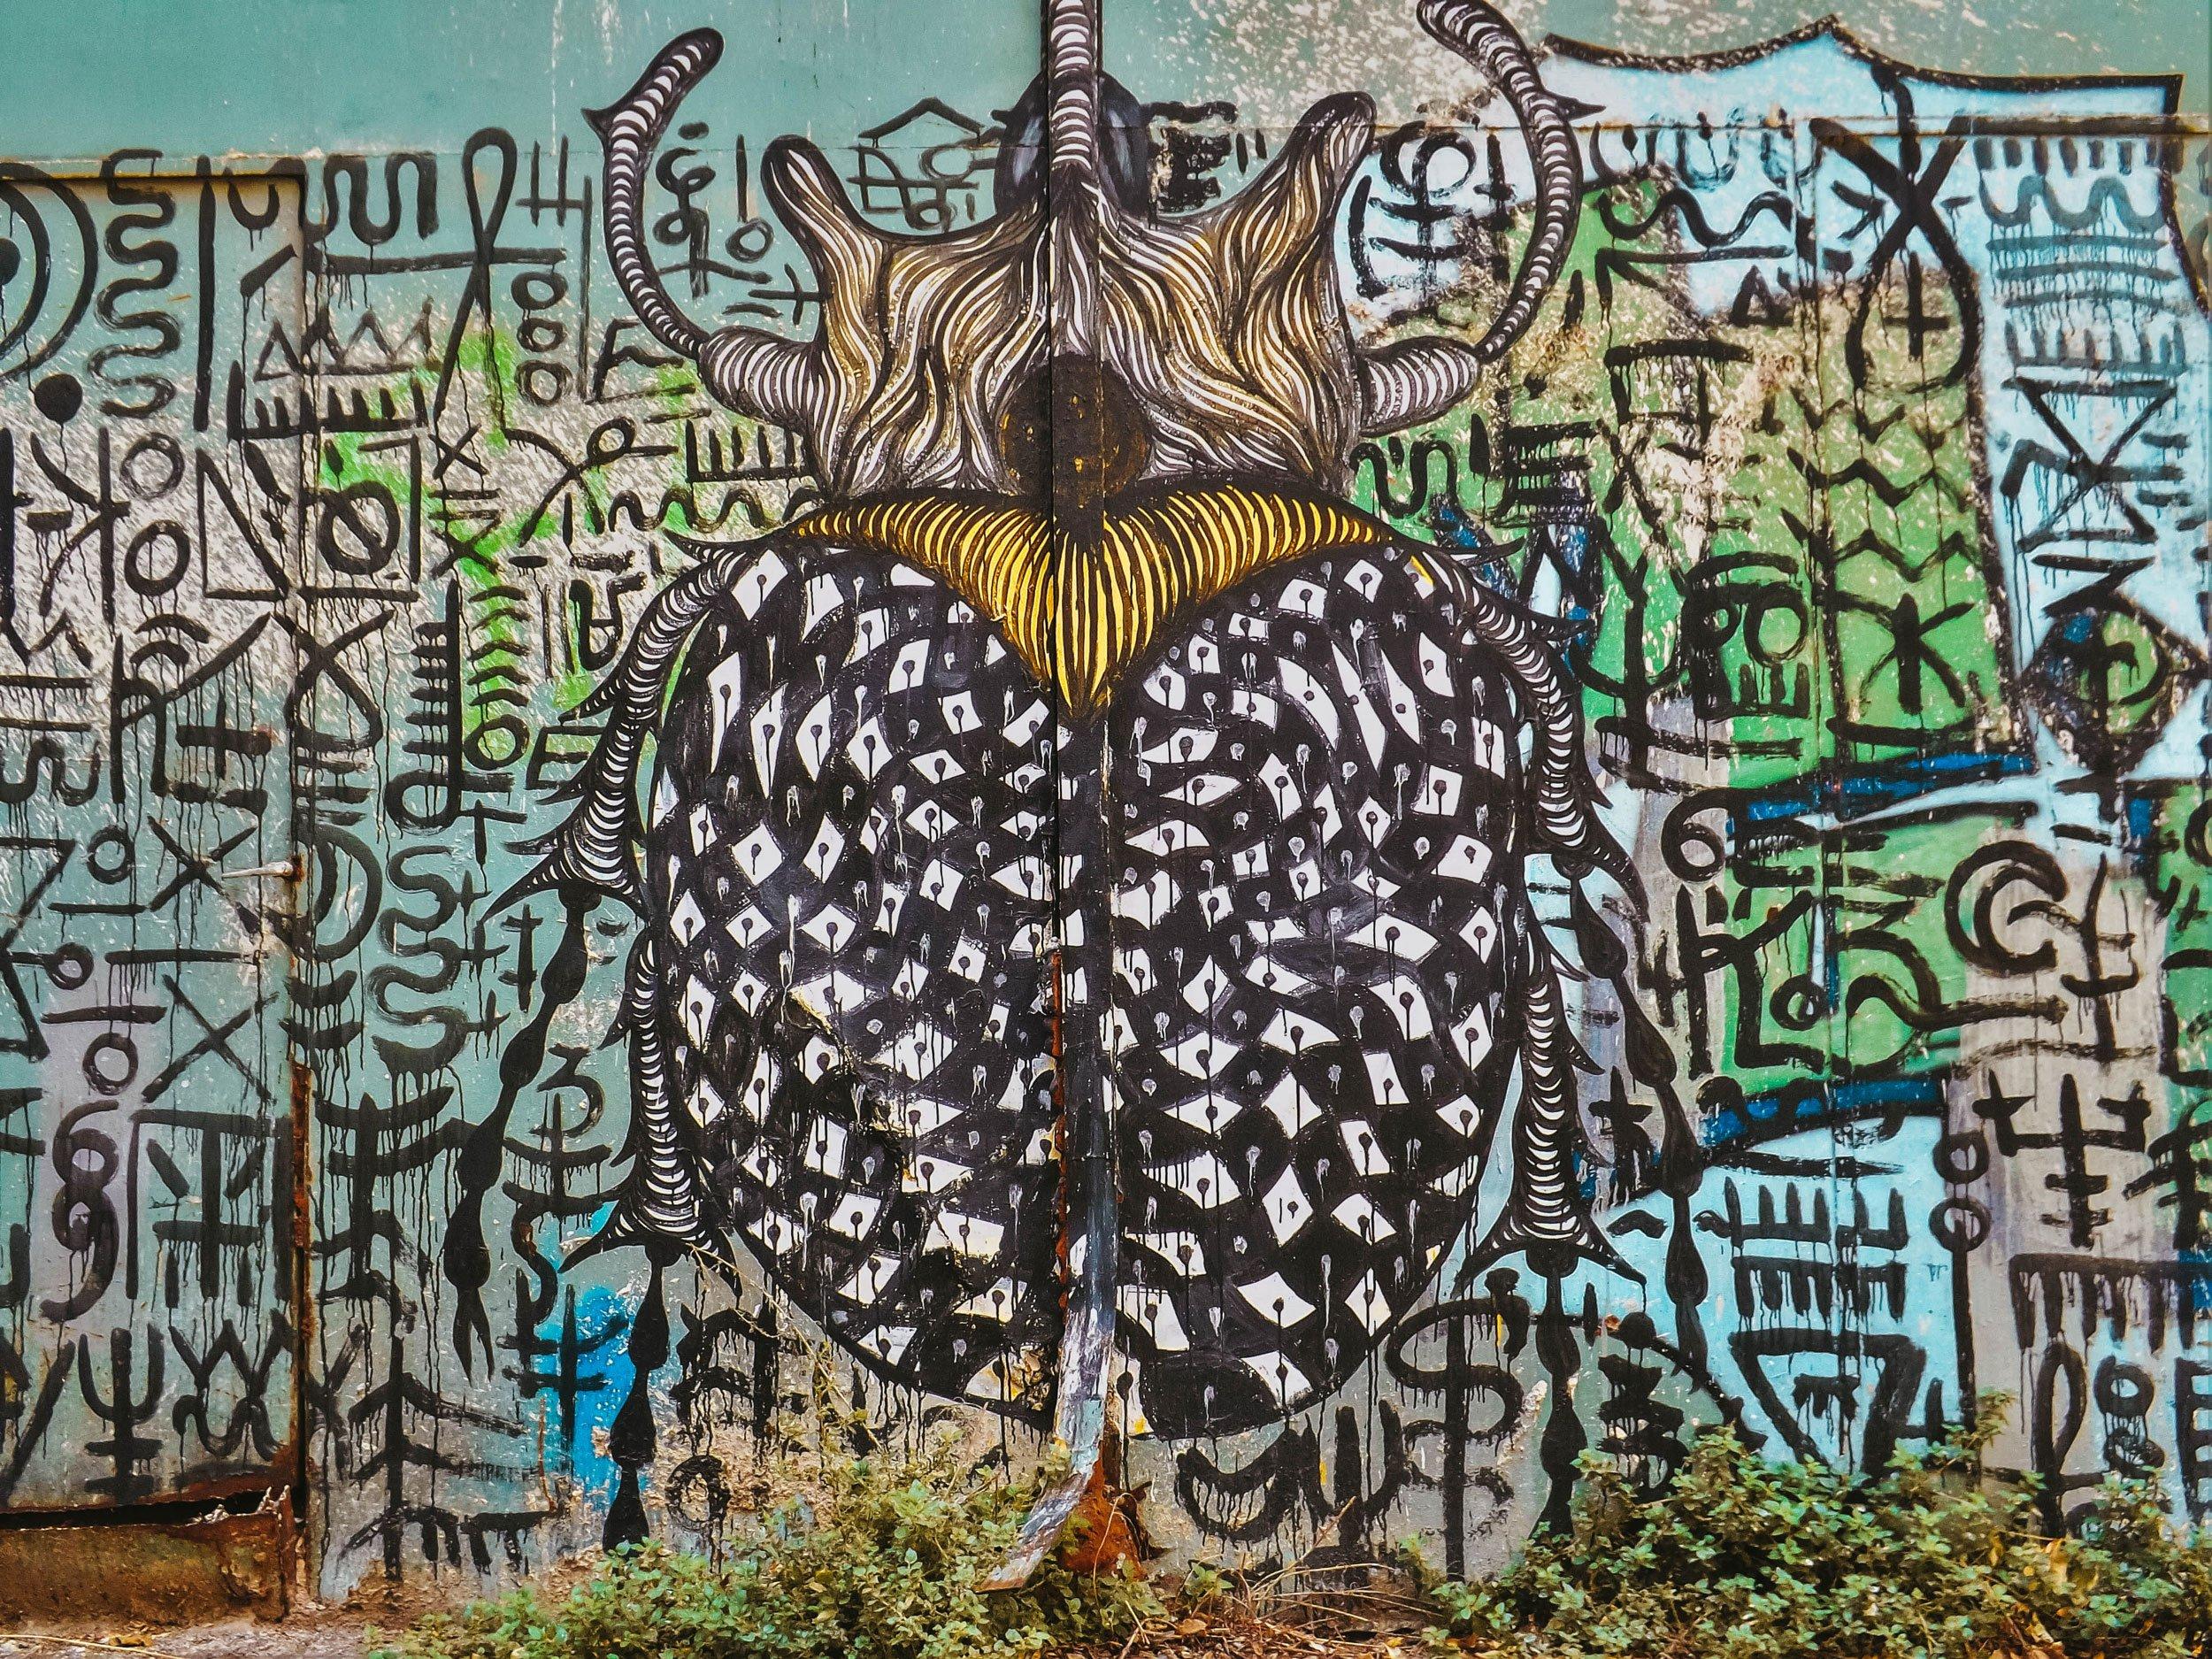 mural in Athens | Best Street Art Cities